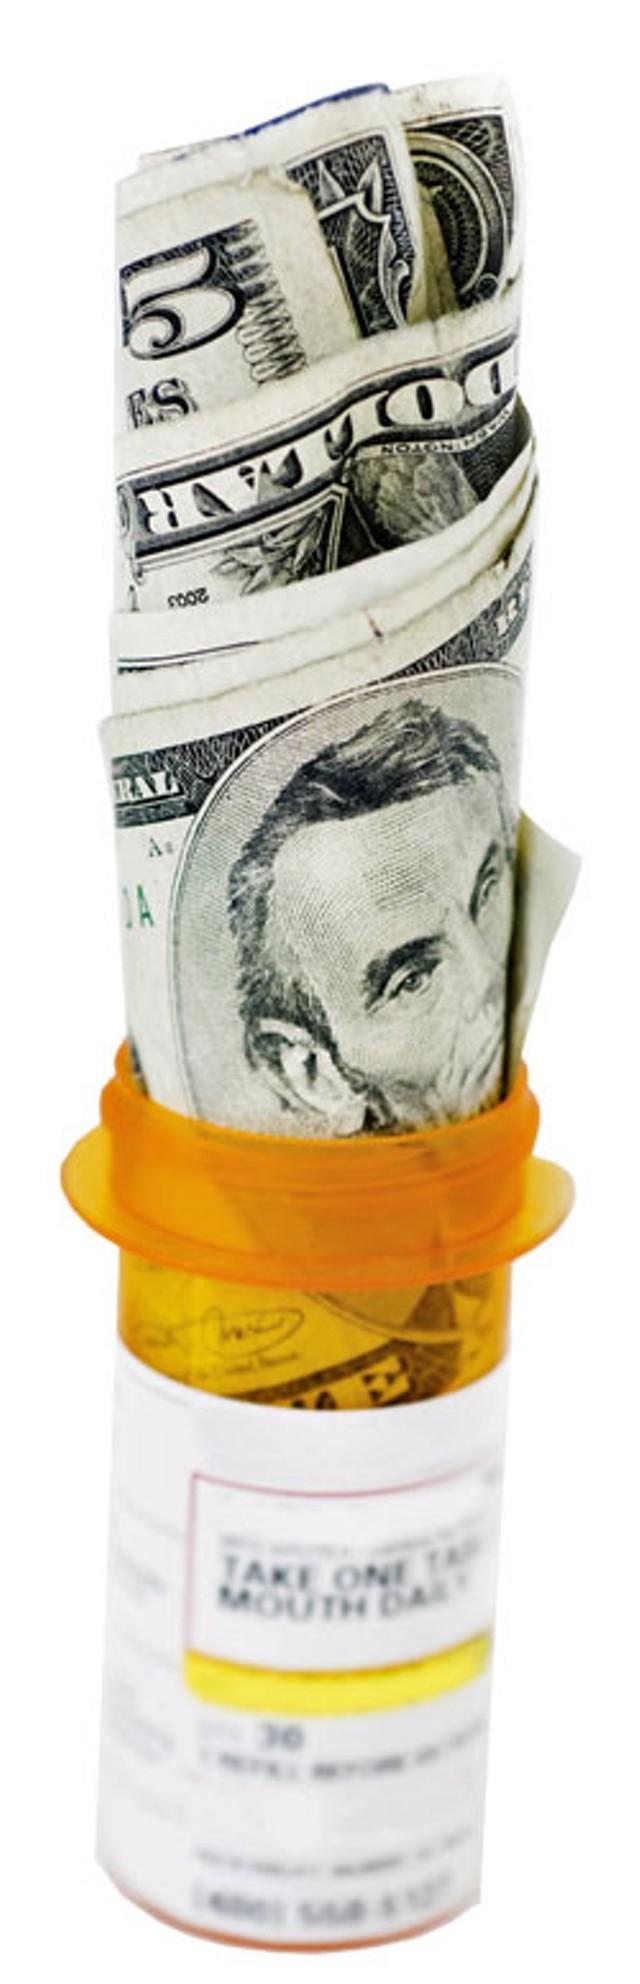 money-prescriptions-dt_6496275.jpg